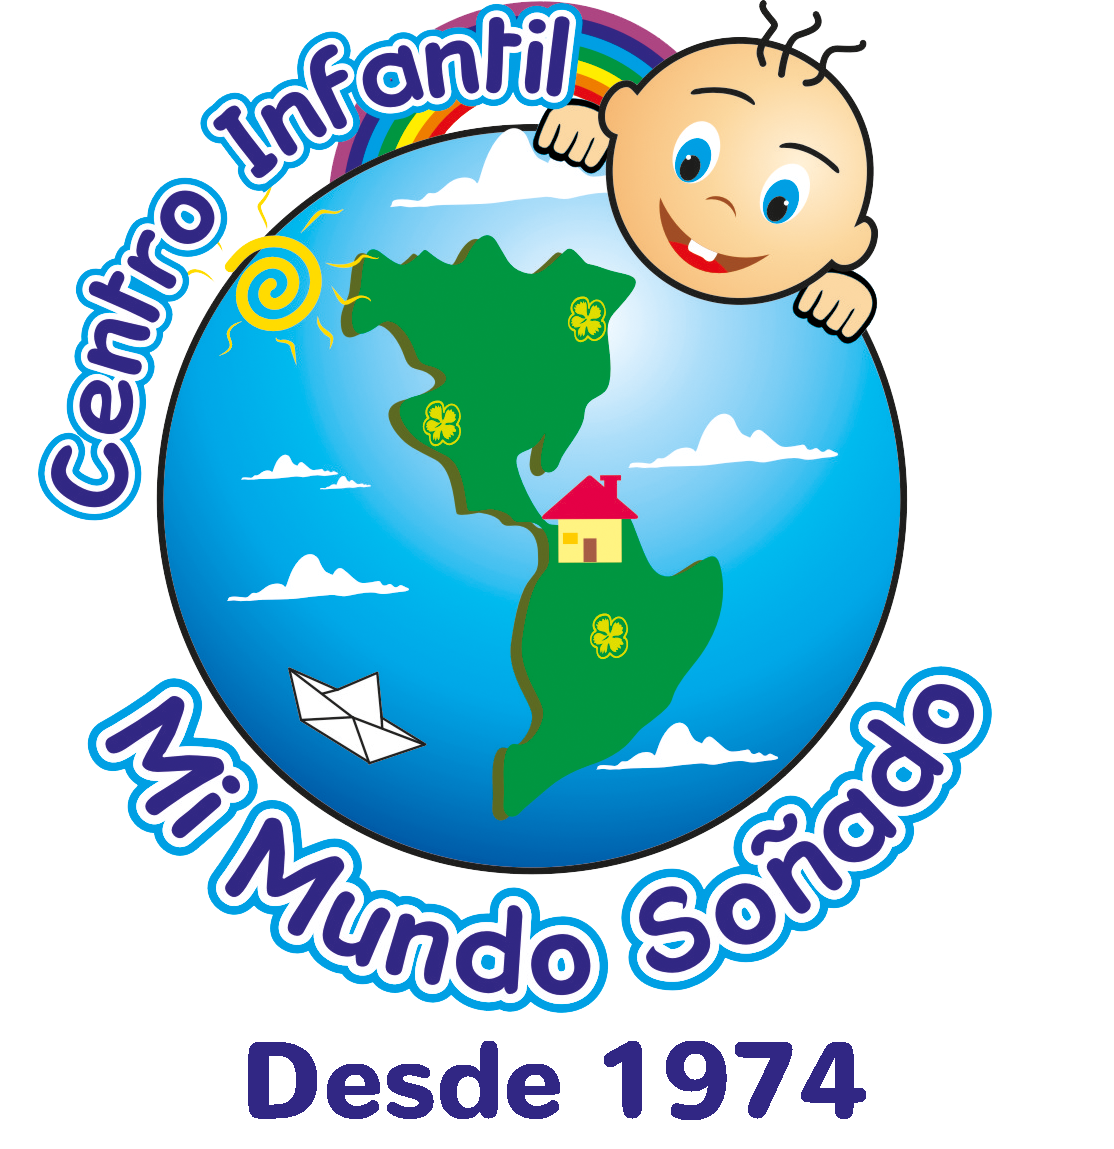 Centro Infantil Mi Mundo Soñado.